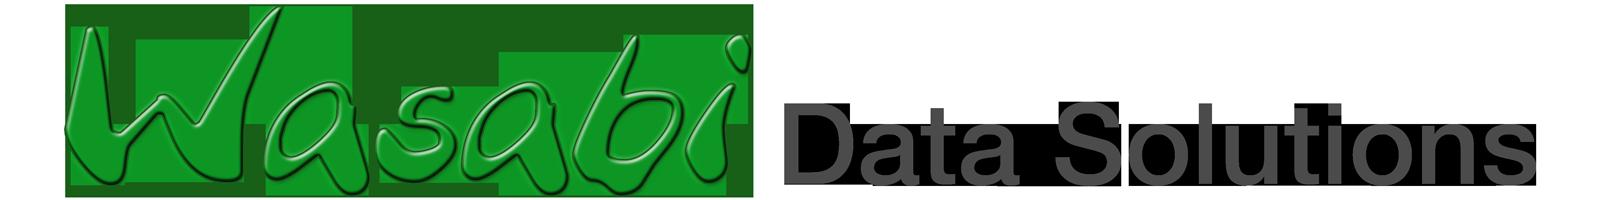 Wasabi Data Solutions